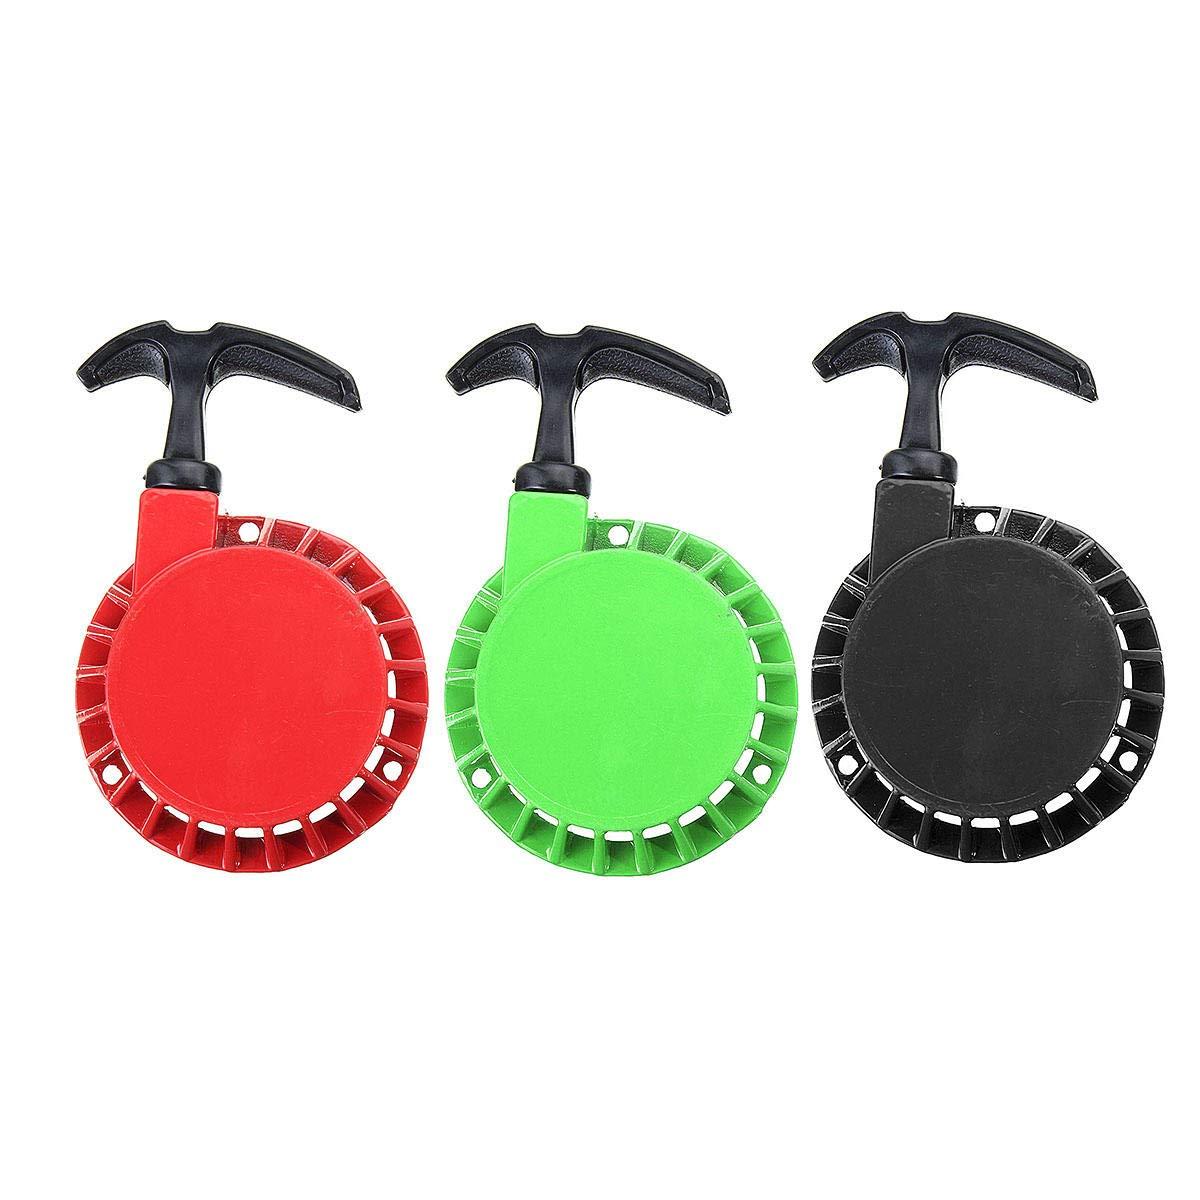 RENCALO 2Pcs Metal 49cc Universal Pull Starter And Flywheel For Dirt Bike Mini Moto Quad 49cc-Green